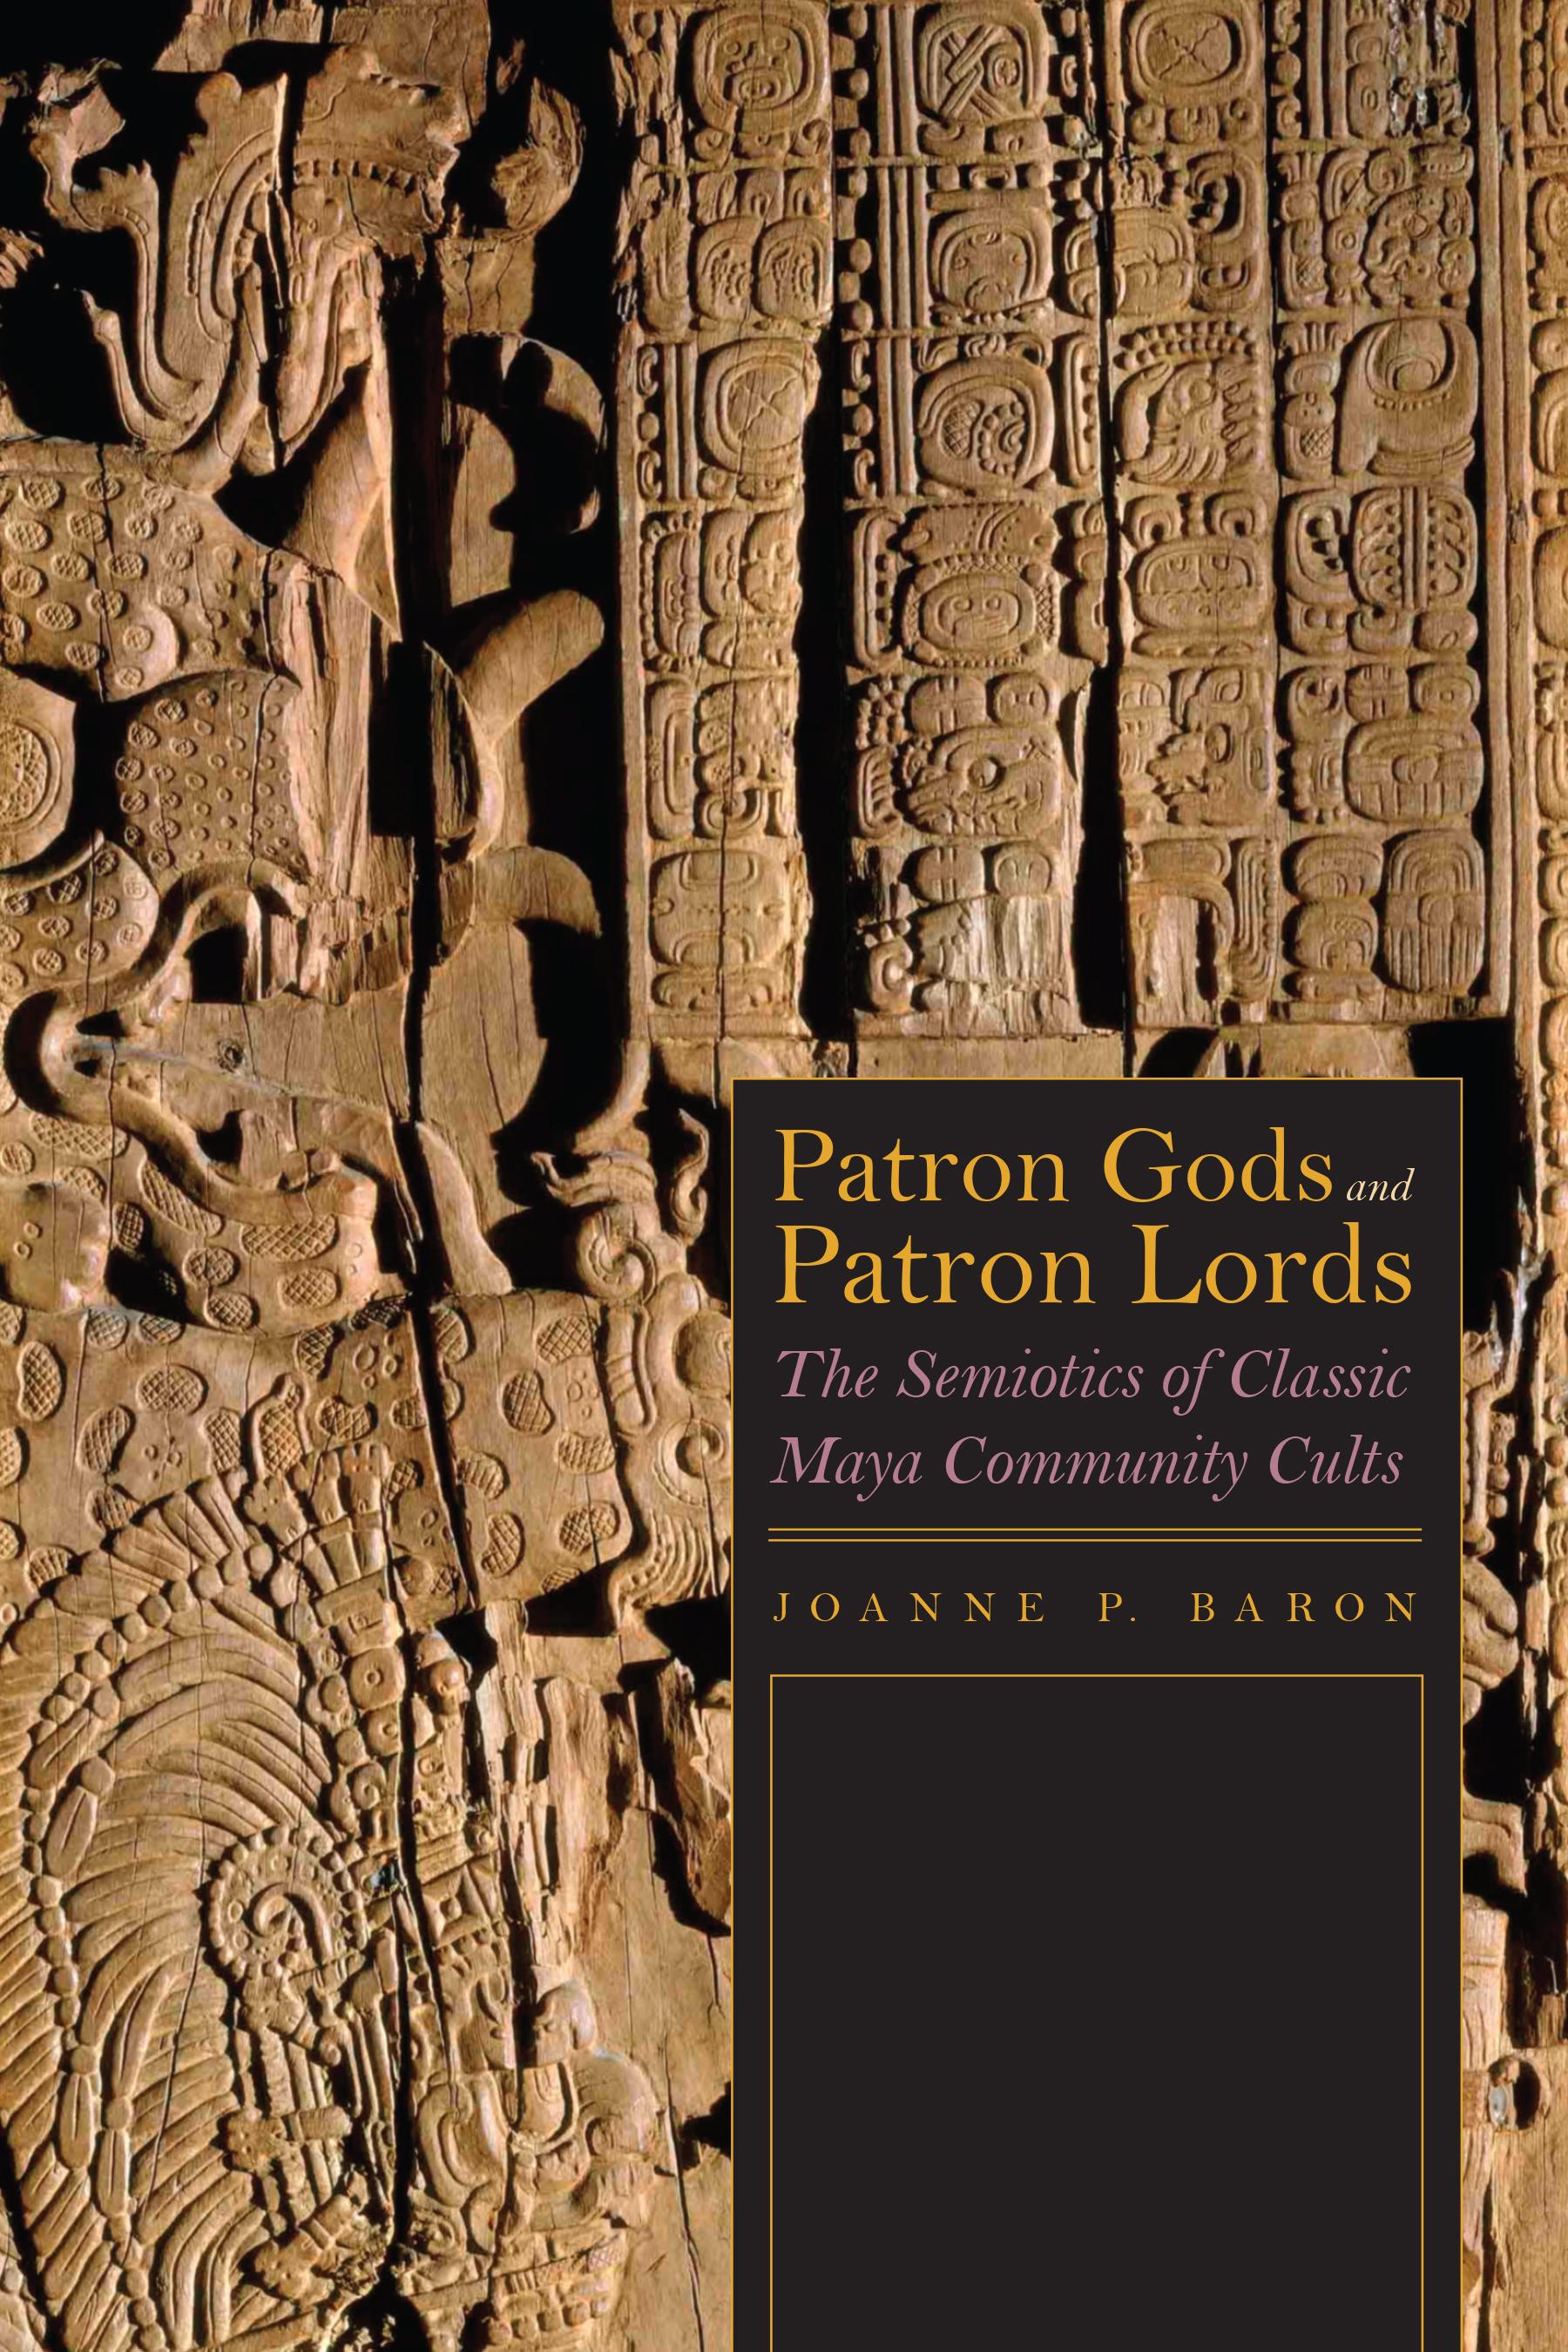 baron-cover-4c